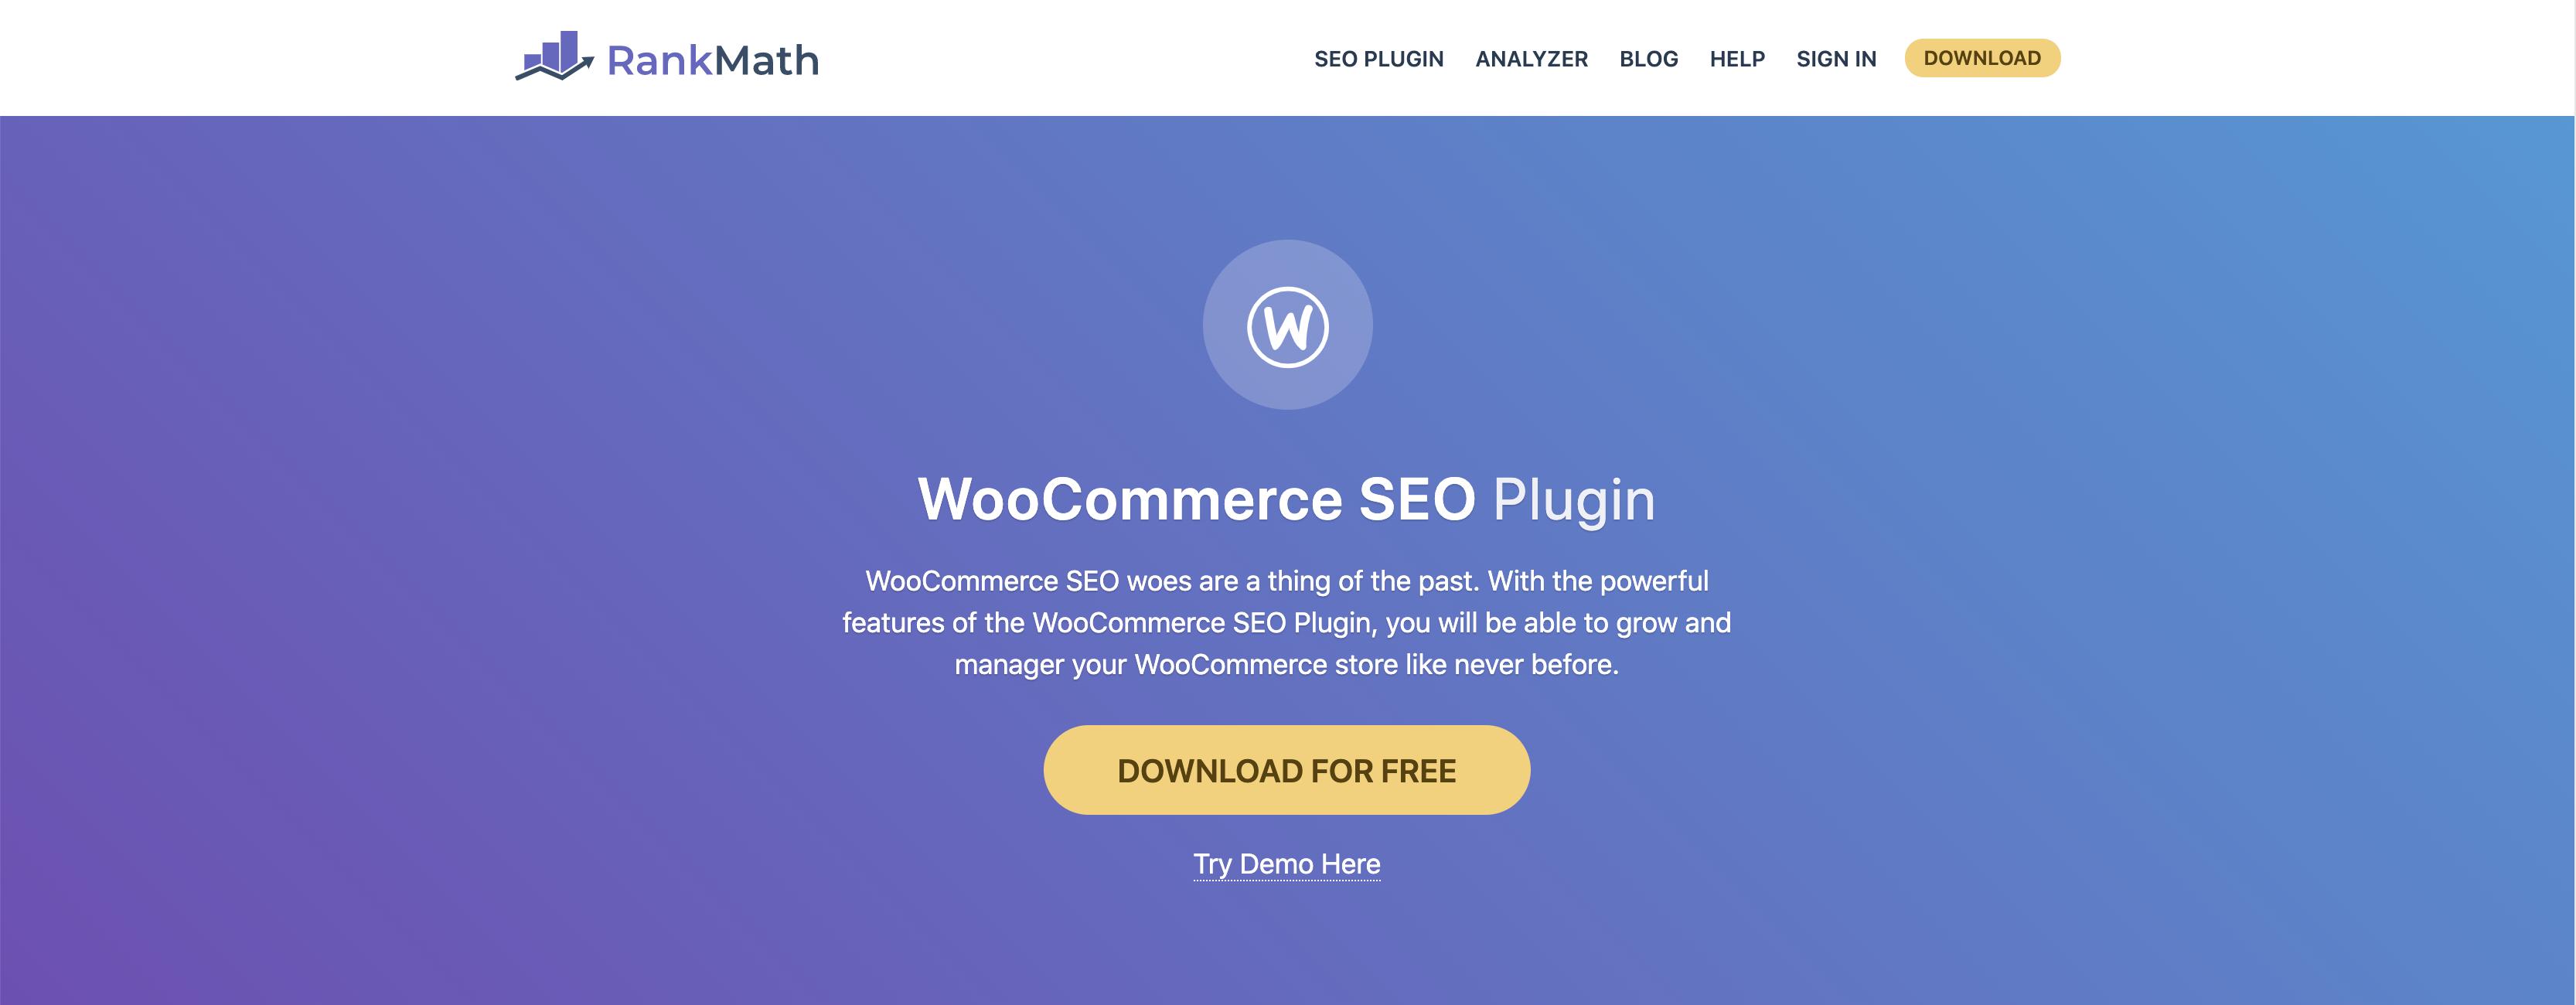 WooCommerce SEO Plugin Rank Math